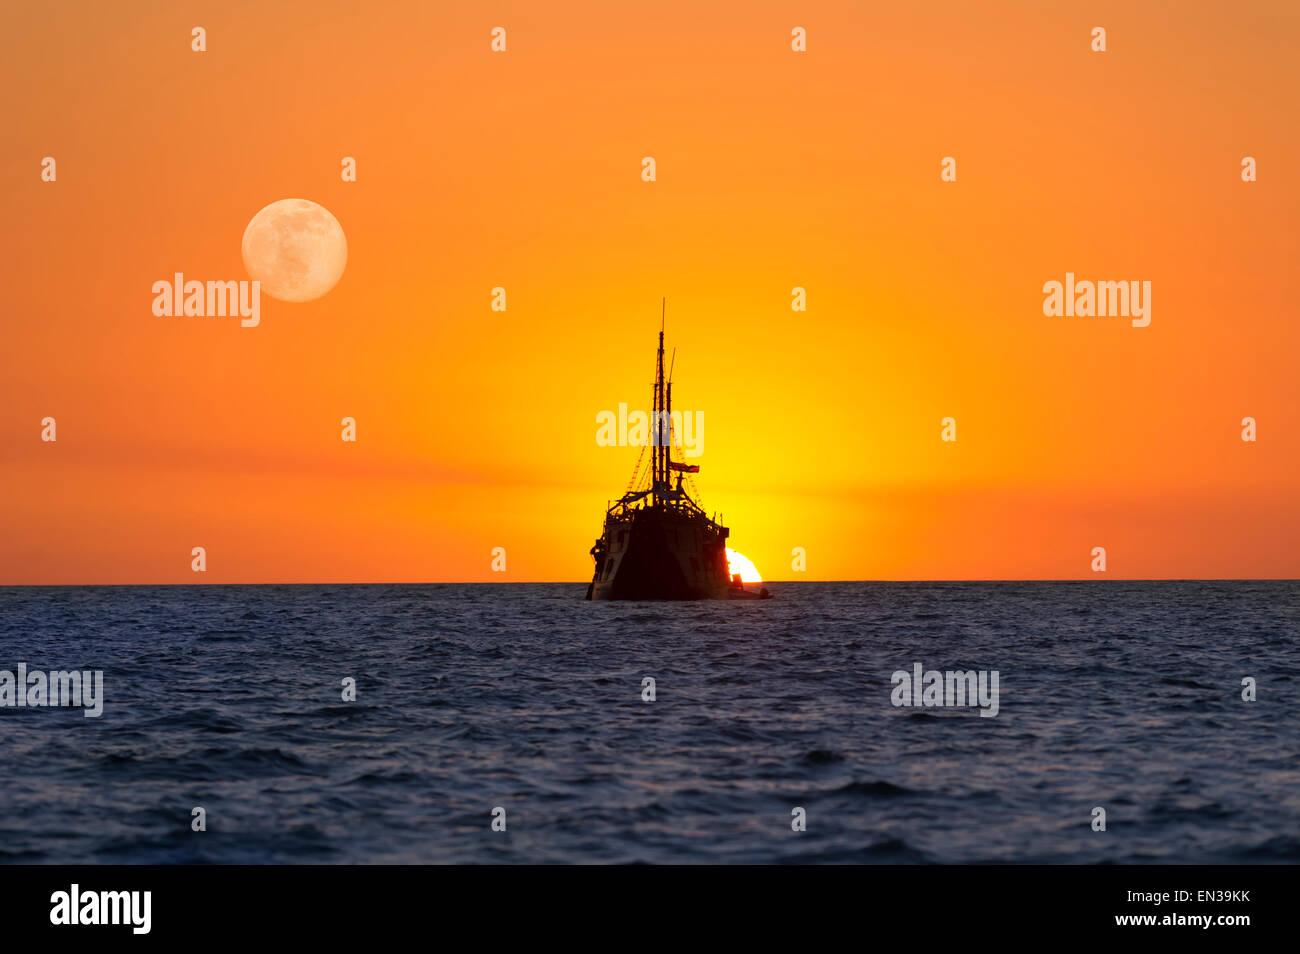 Old Wooden Ship Sits At Sea As The Sun Sets And Moon Rises Like A Fantasy